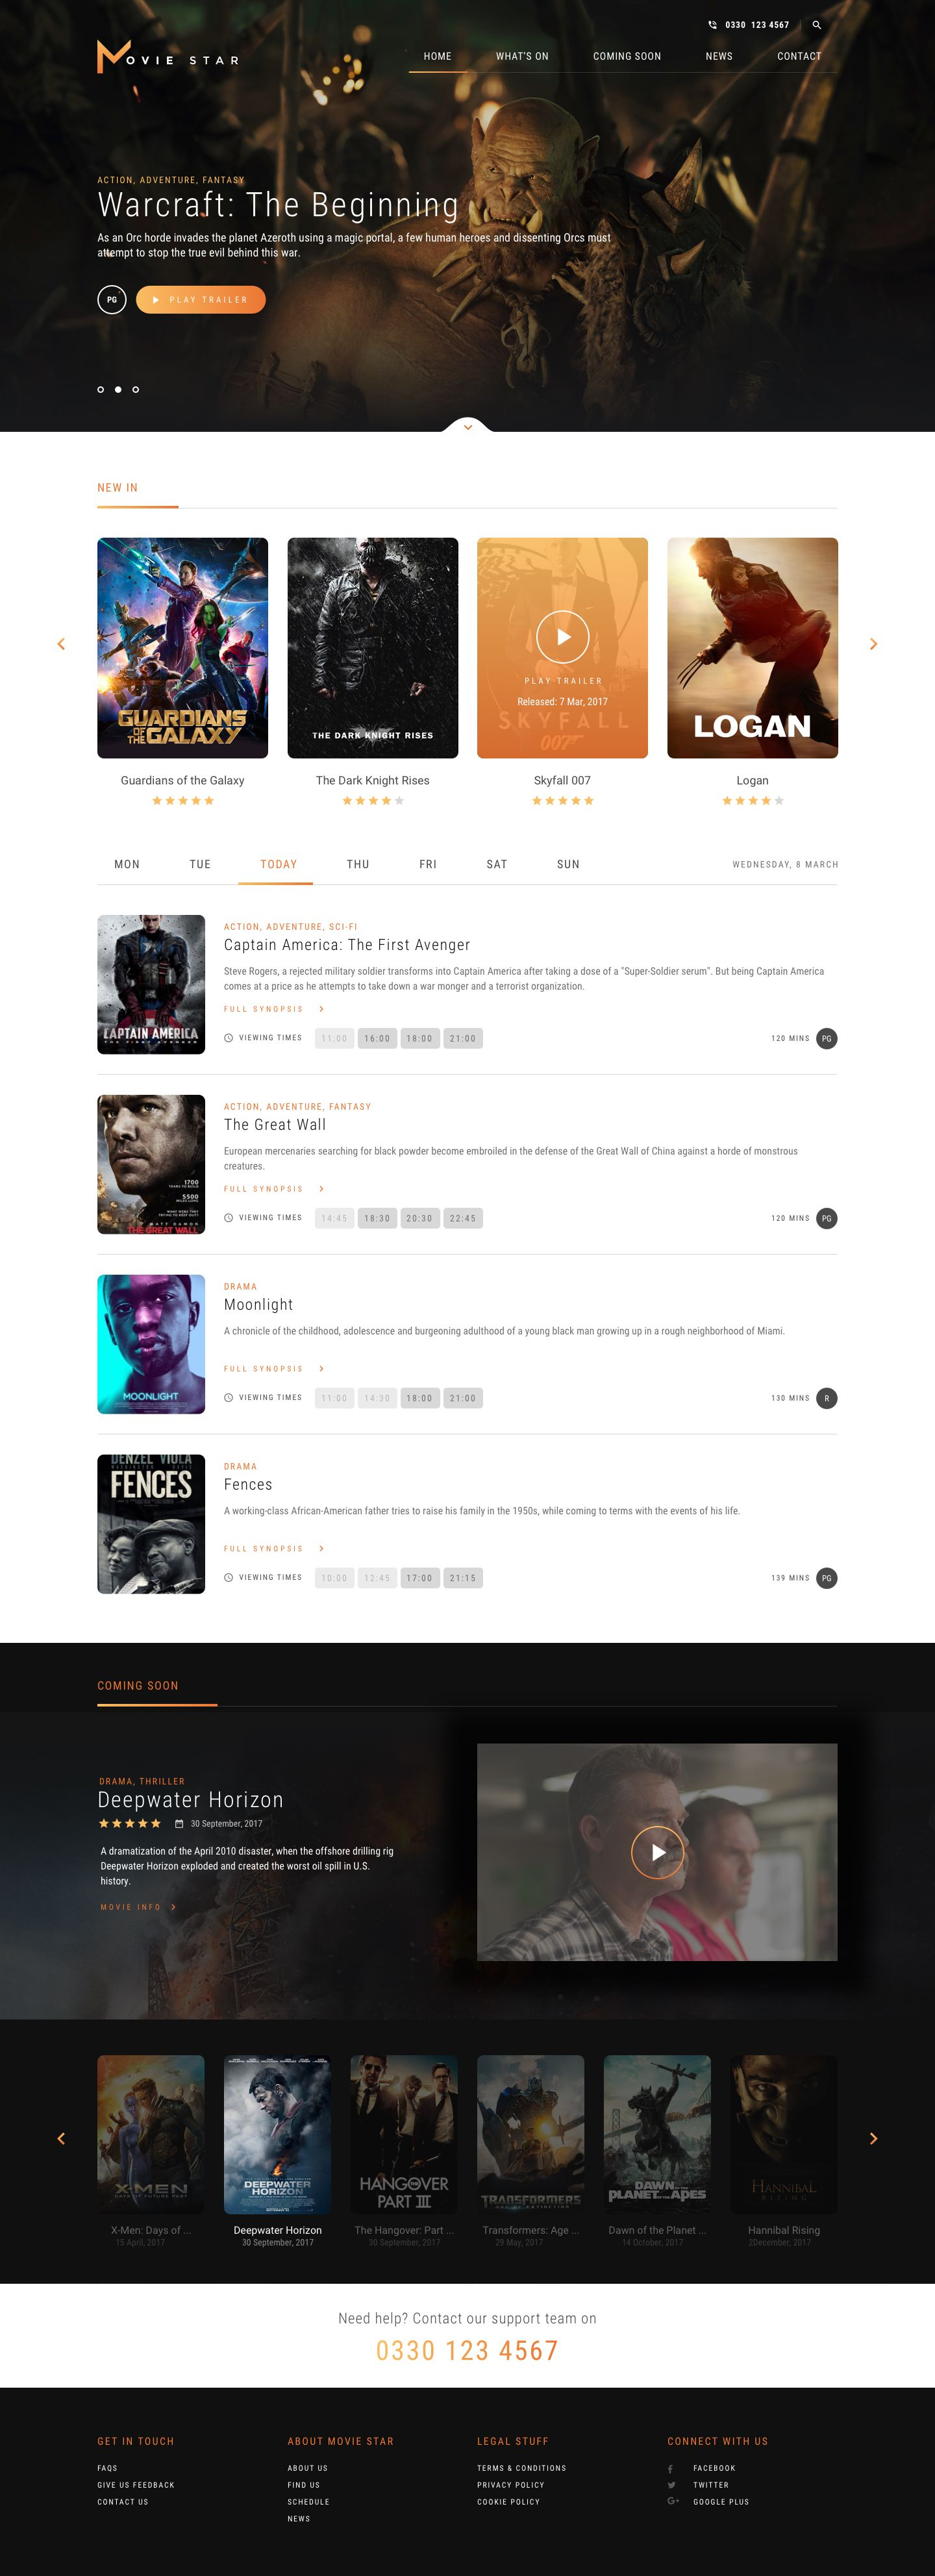 Movie Star Cinema Html Template By Kleverthemes Themeforest